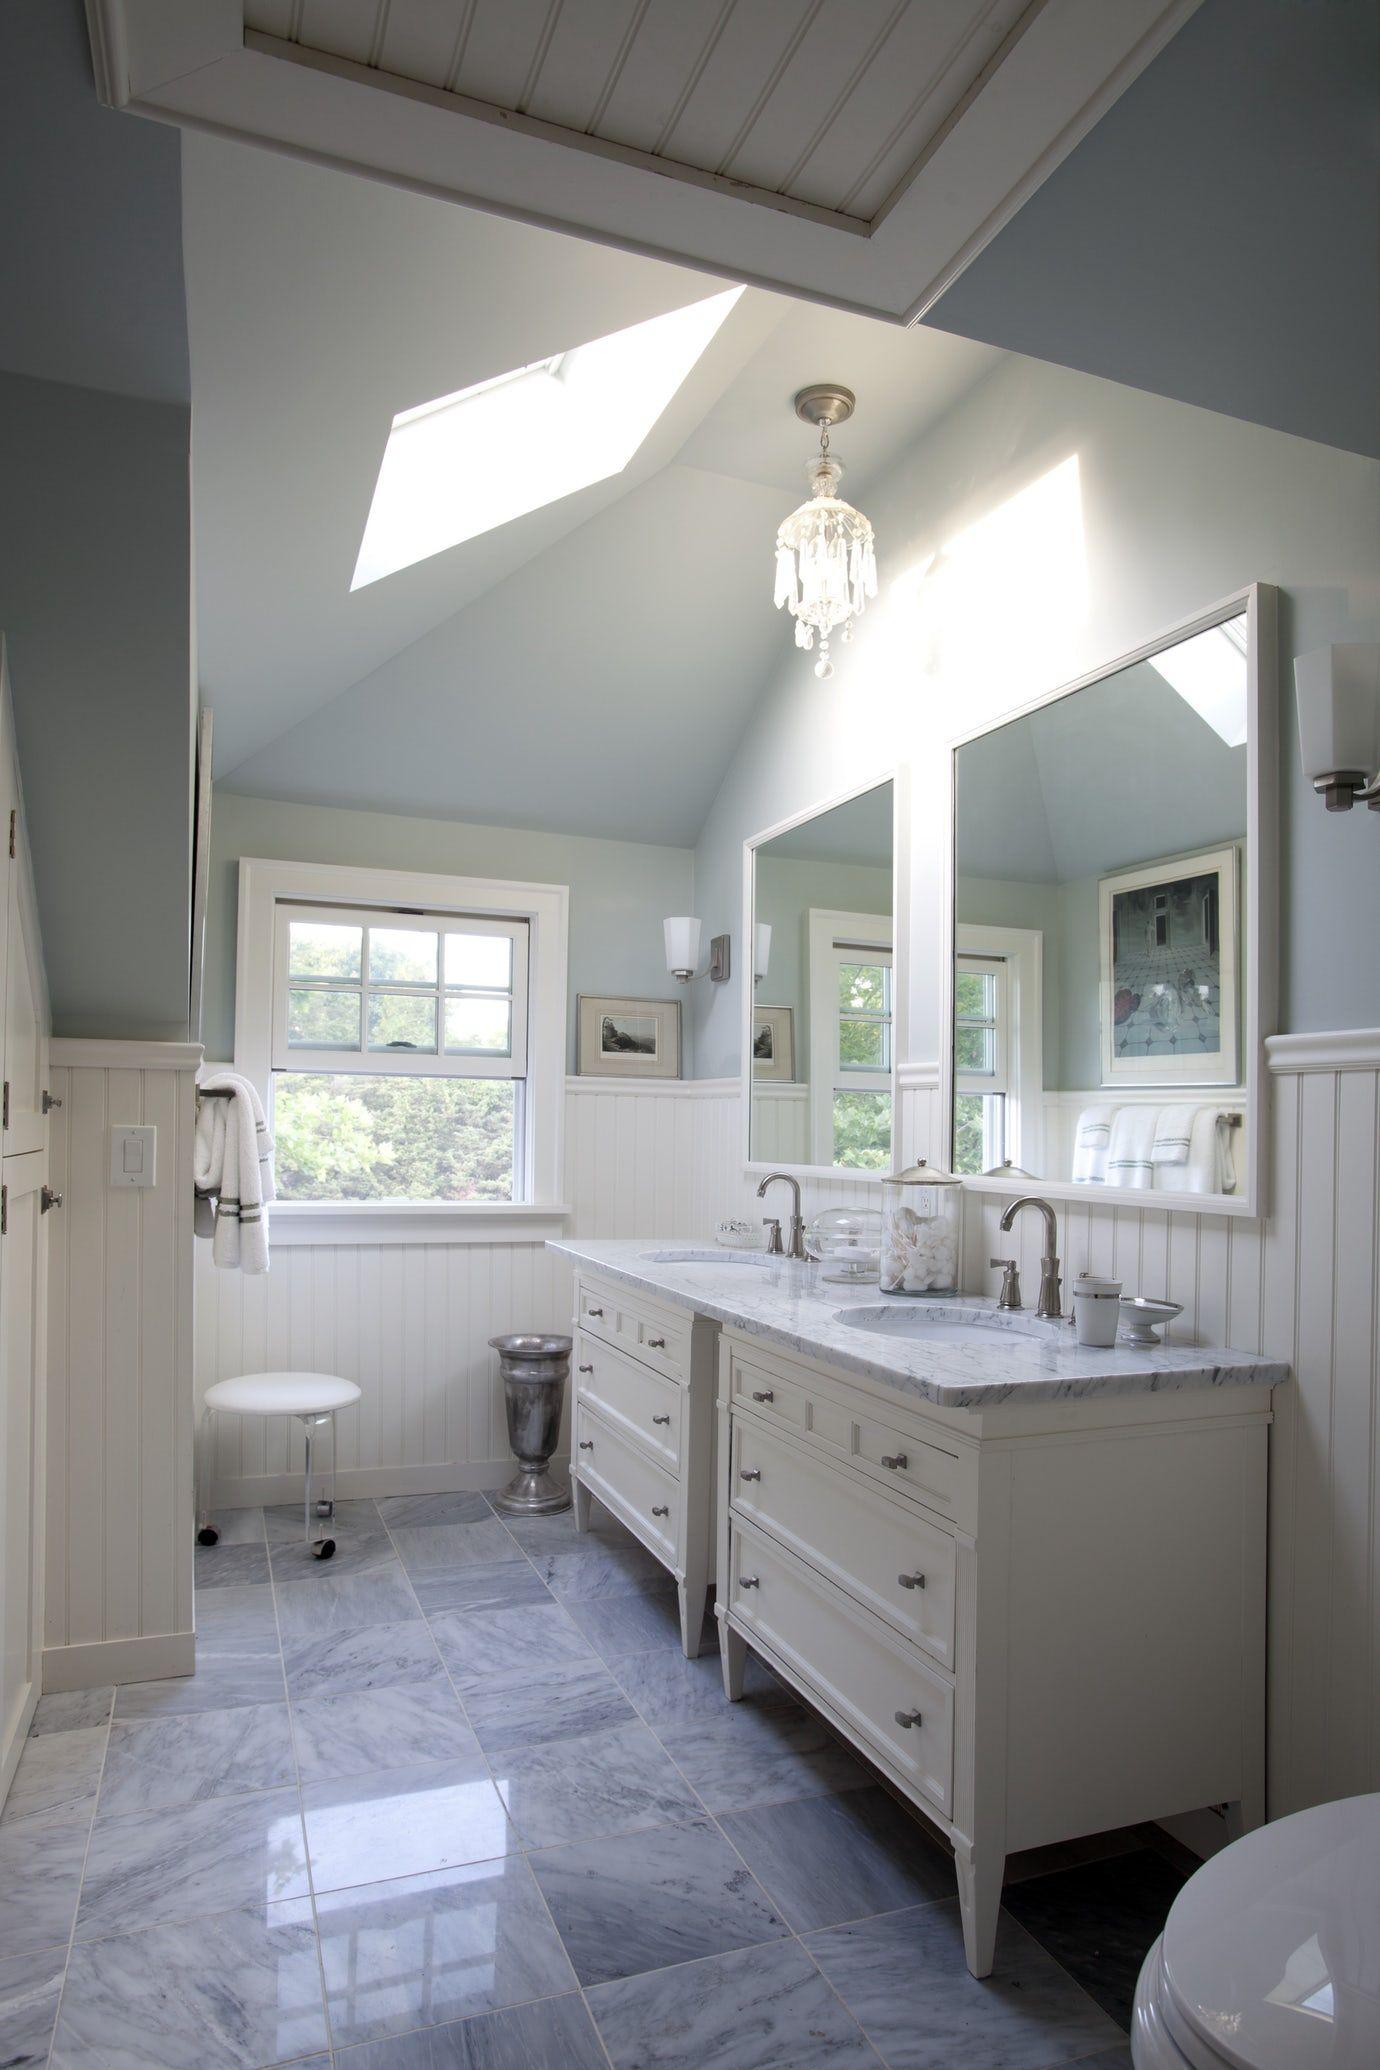 Master Bathroom of a House in the Hamptons Bath Design ...